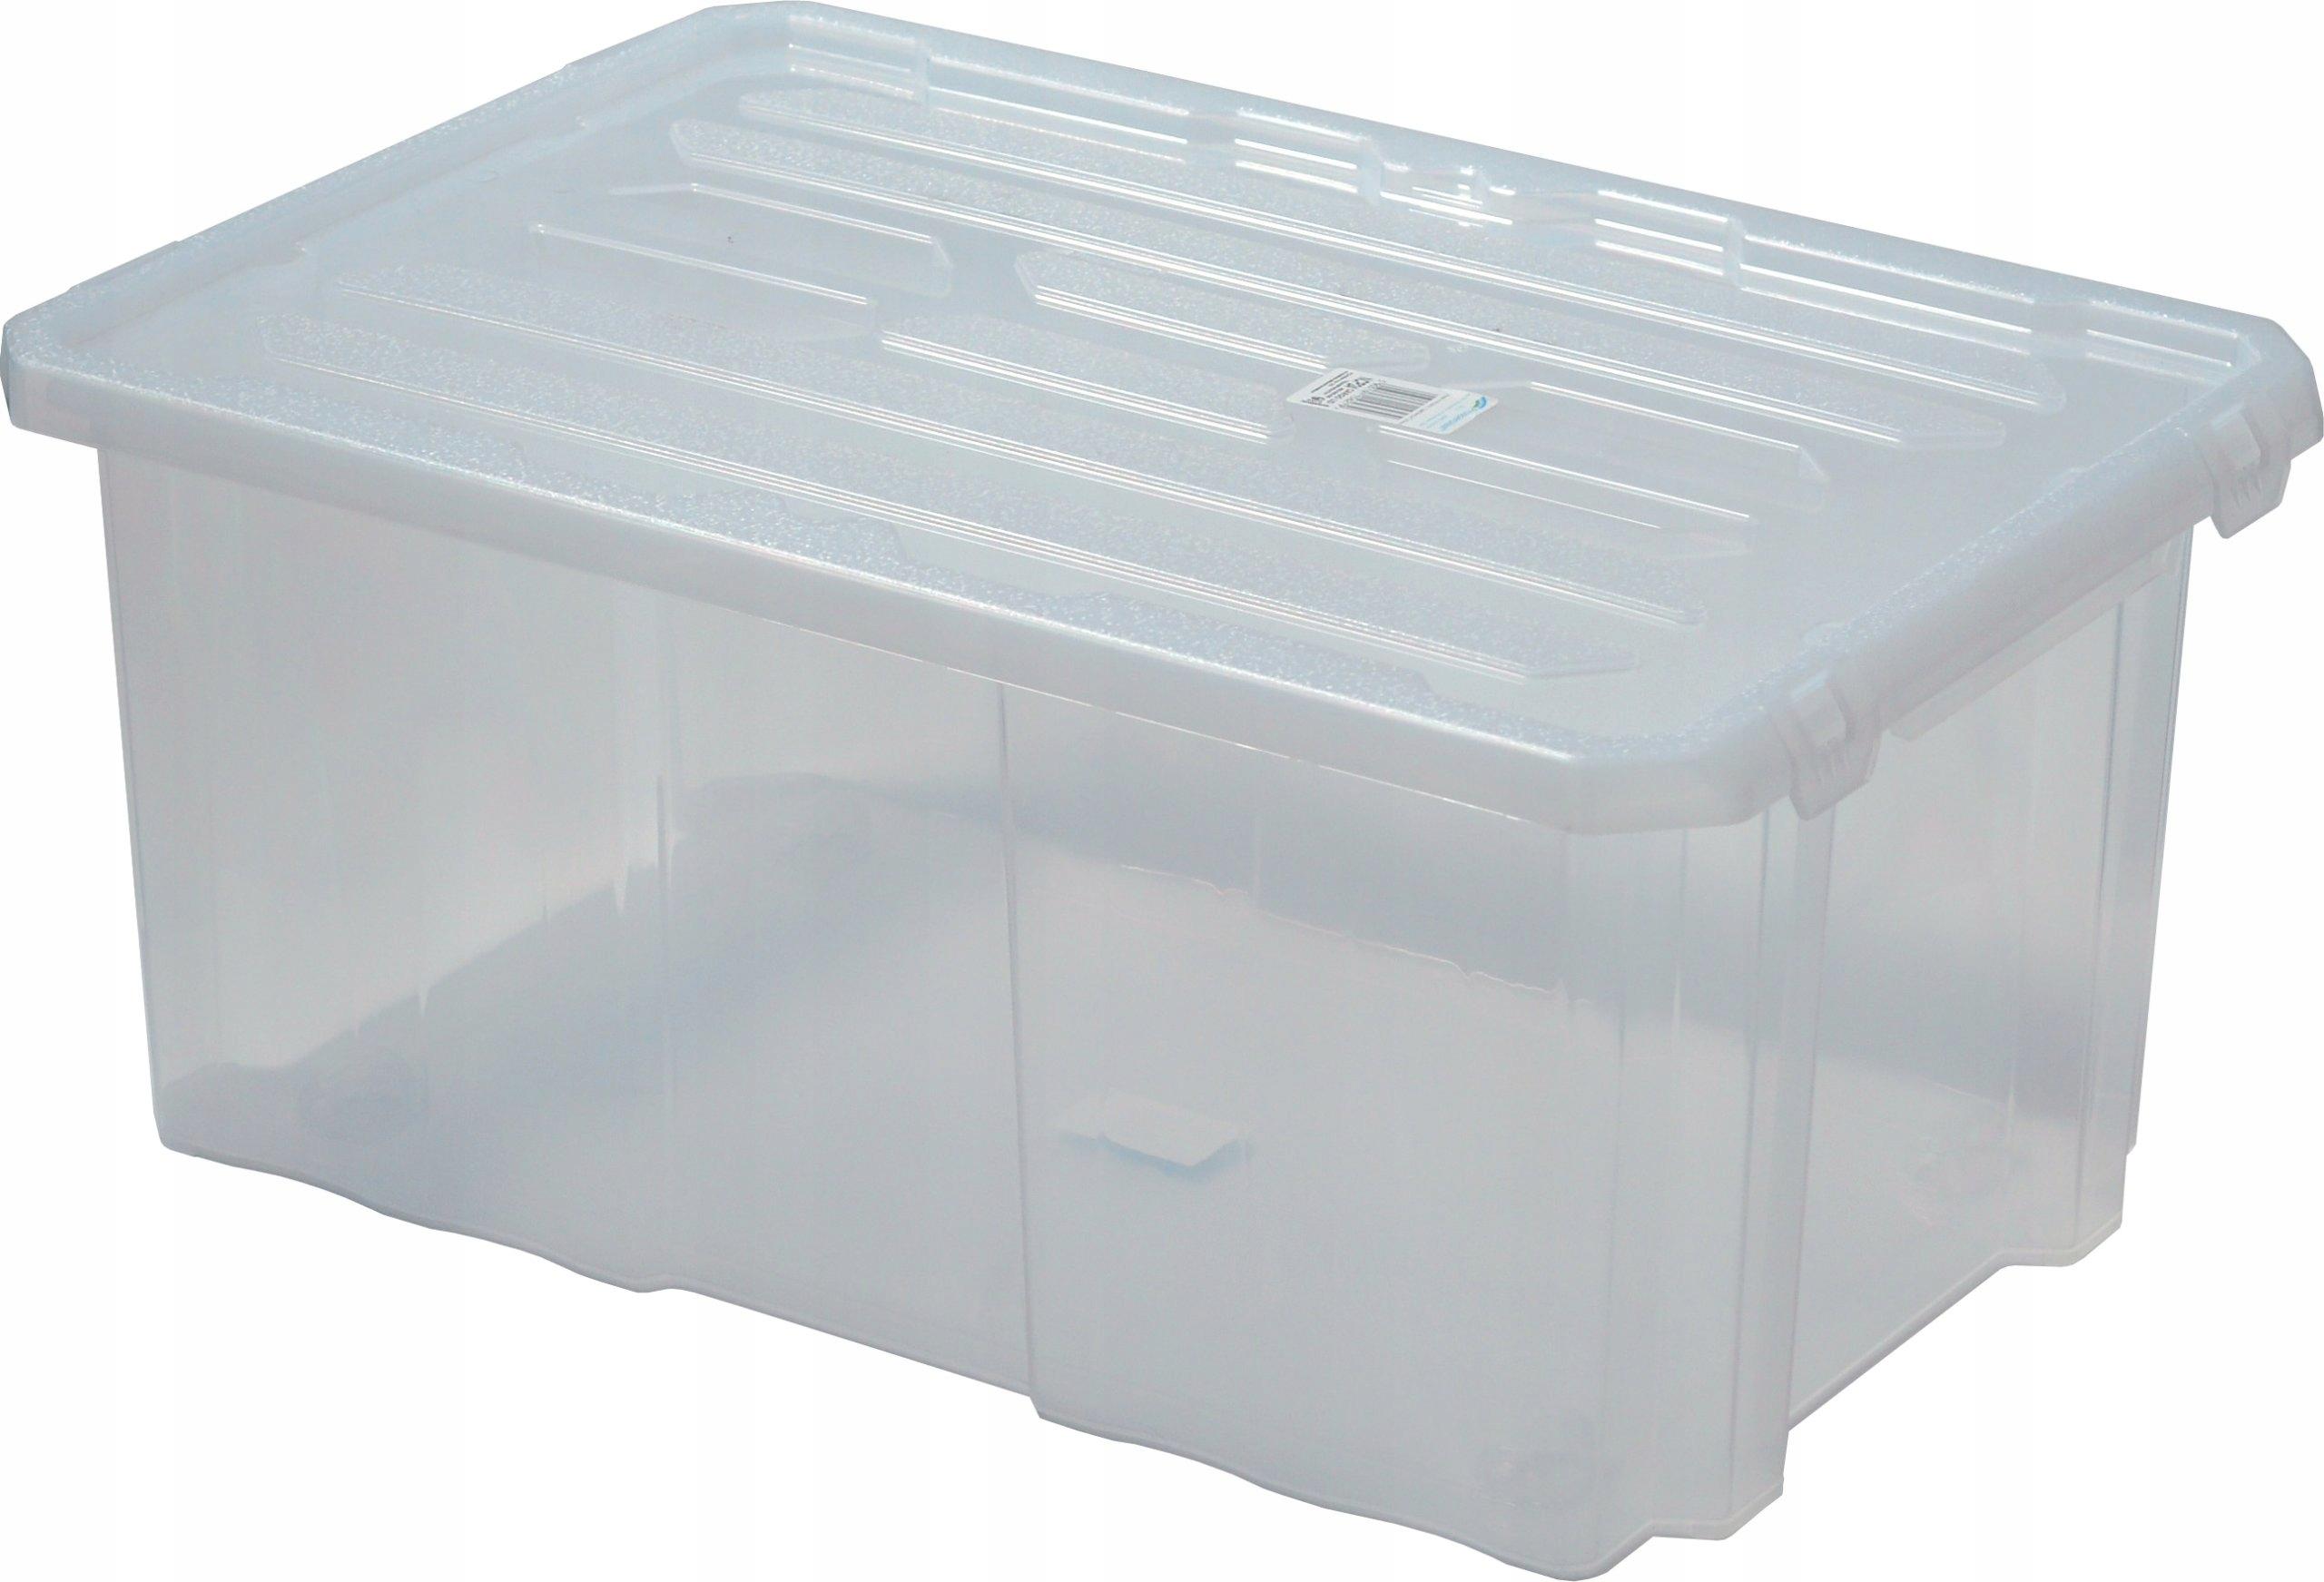 Pudełko Pudło Pokrywa Plastikowe Box 45l Duże 6970502874 Allegro Pl